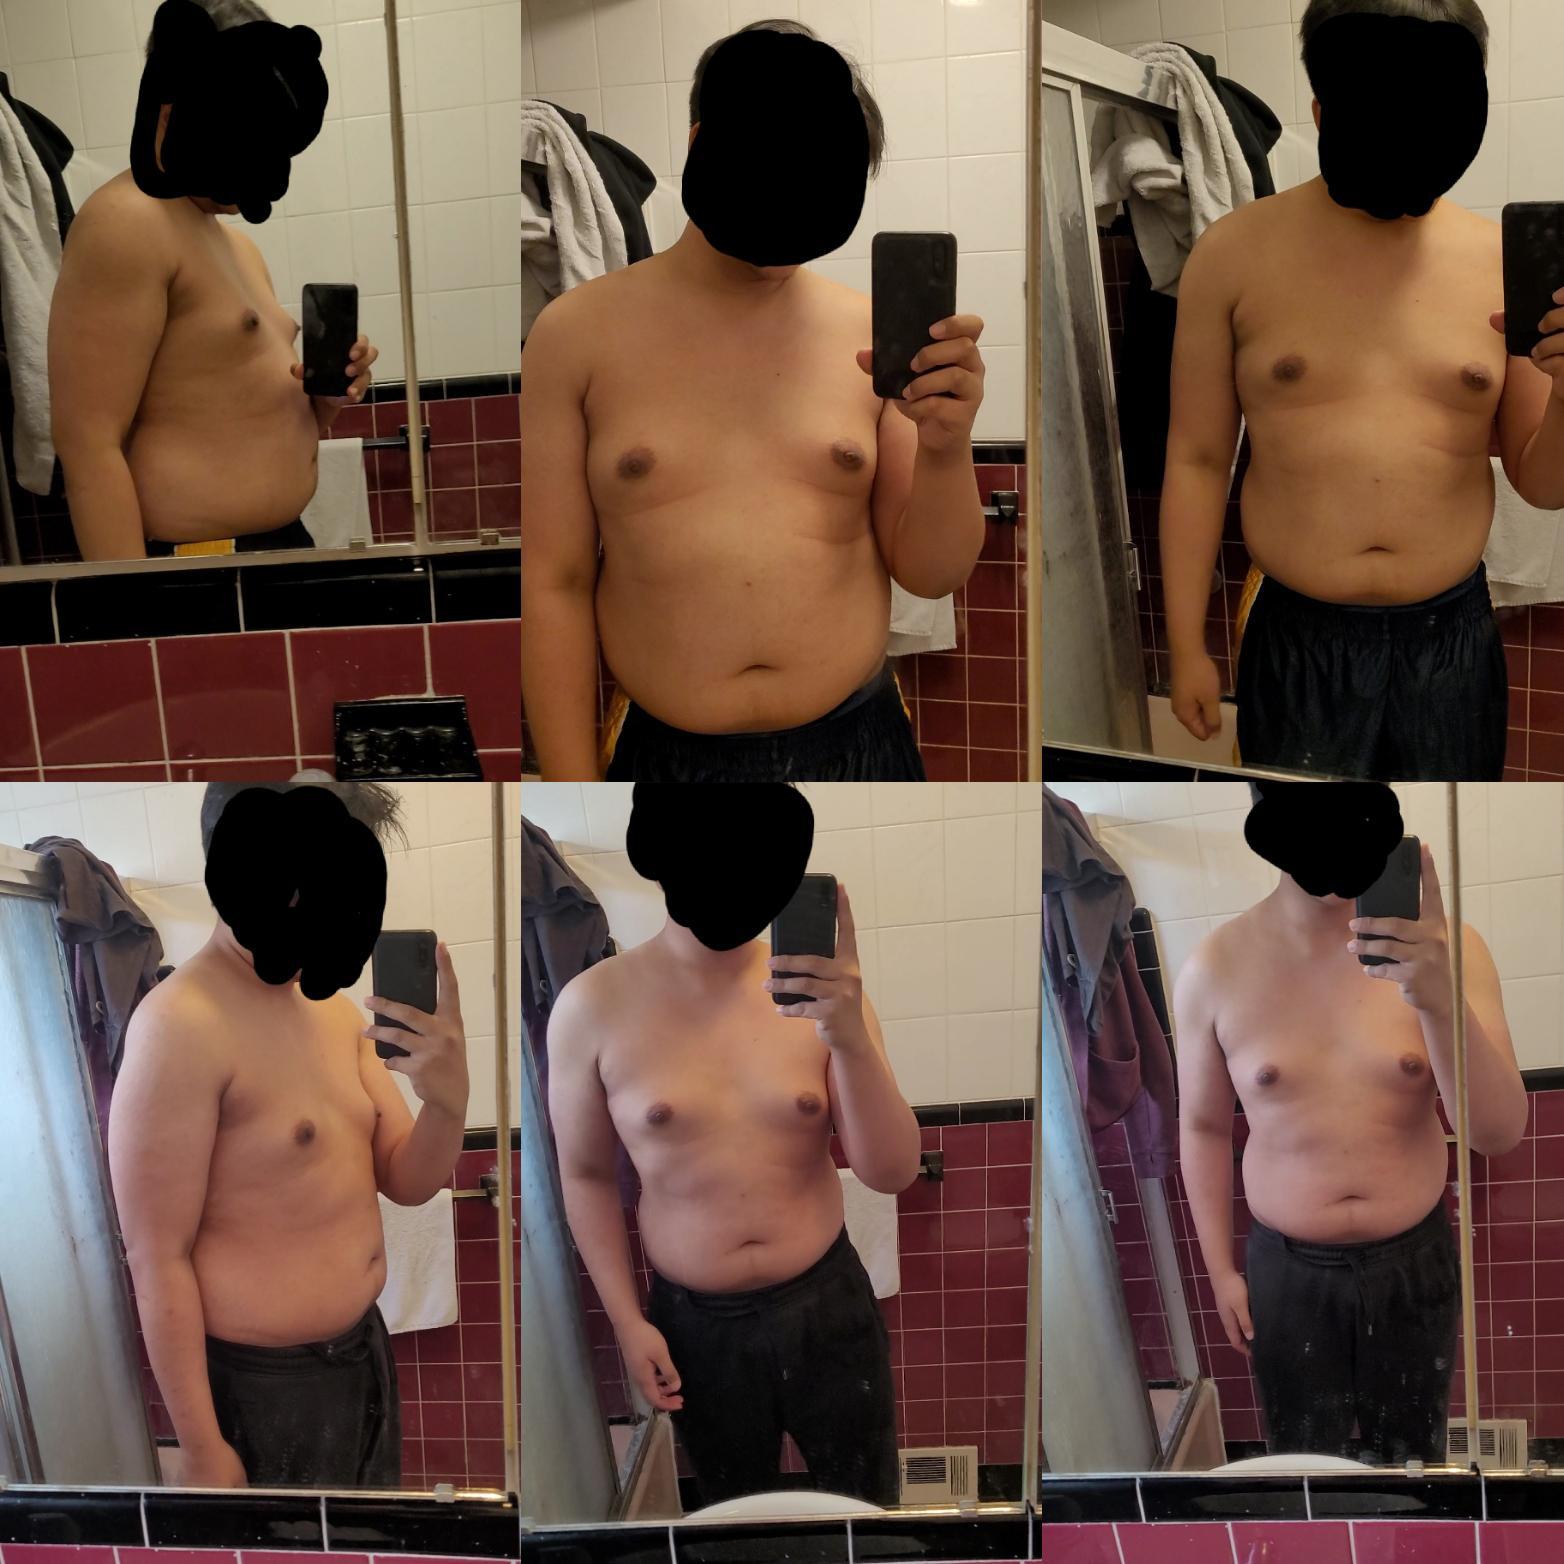 6 foot 2 Male Progress Pics of 25 lbs Weight Loss 260 lbs to 235 lbs